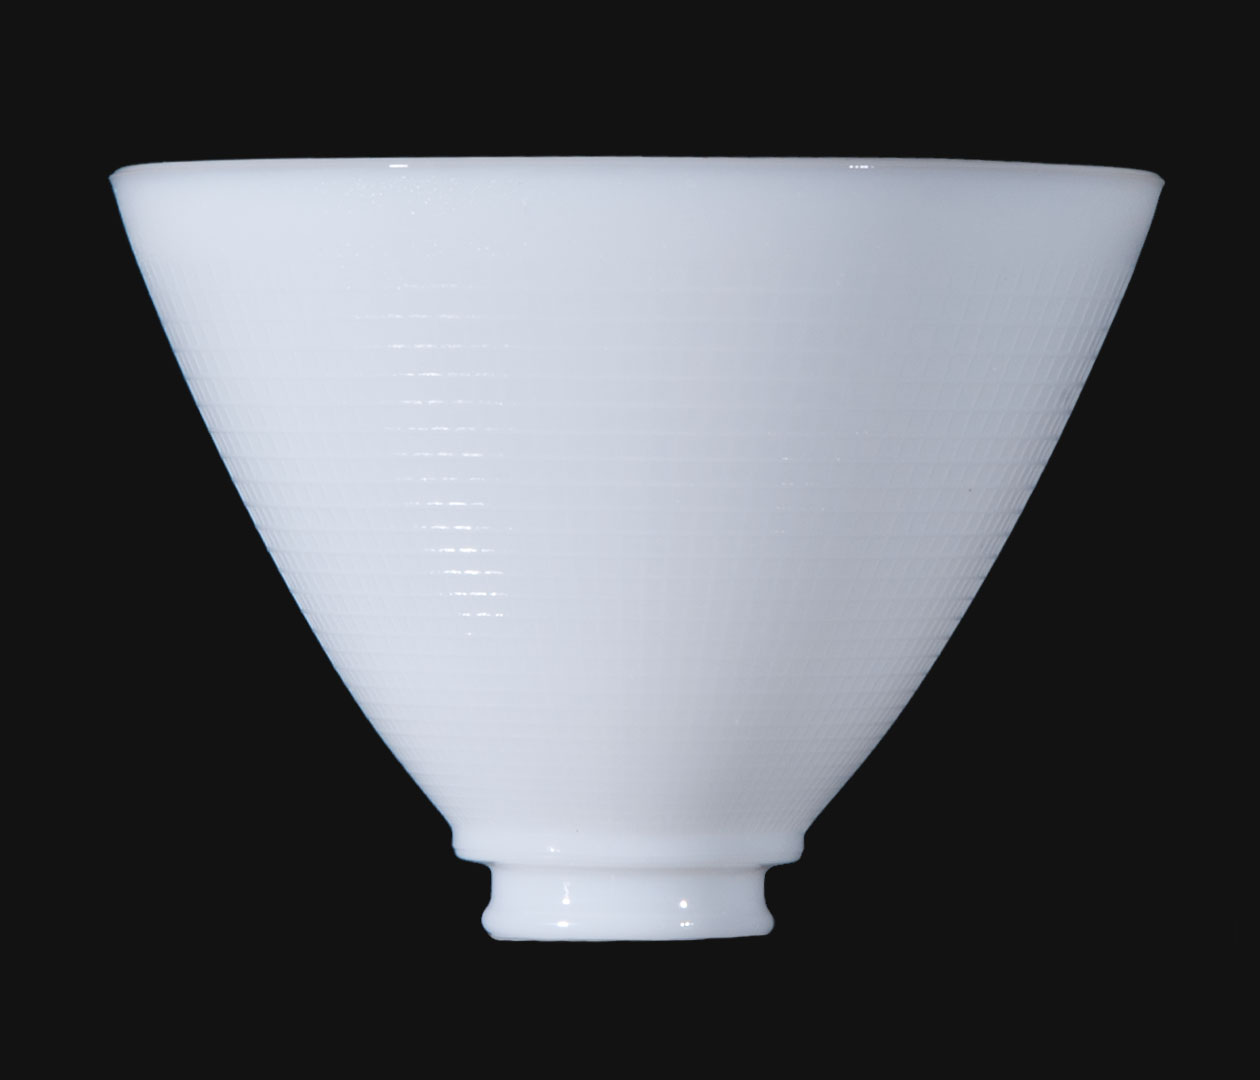 8 I E S Opal Glass Reflector Shade 08391 B Amp P Lamp Supply